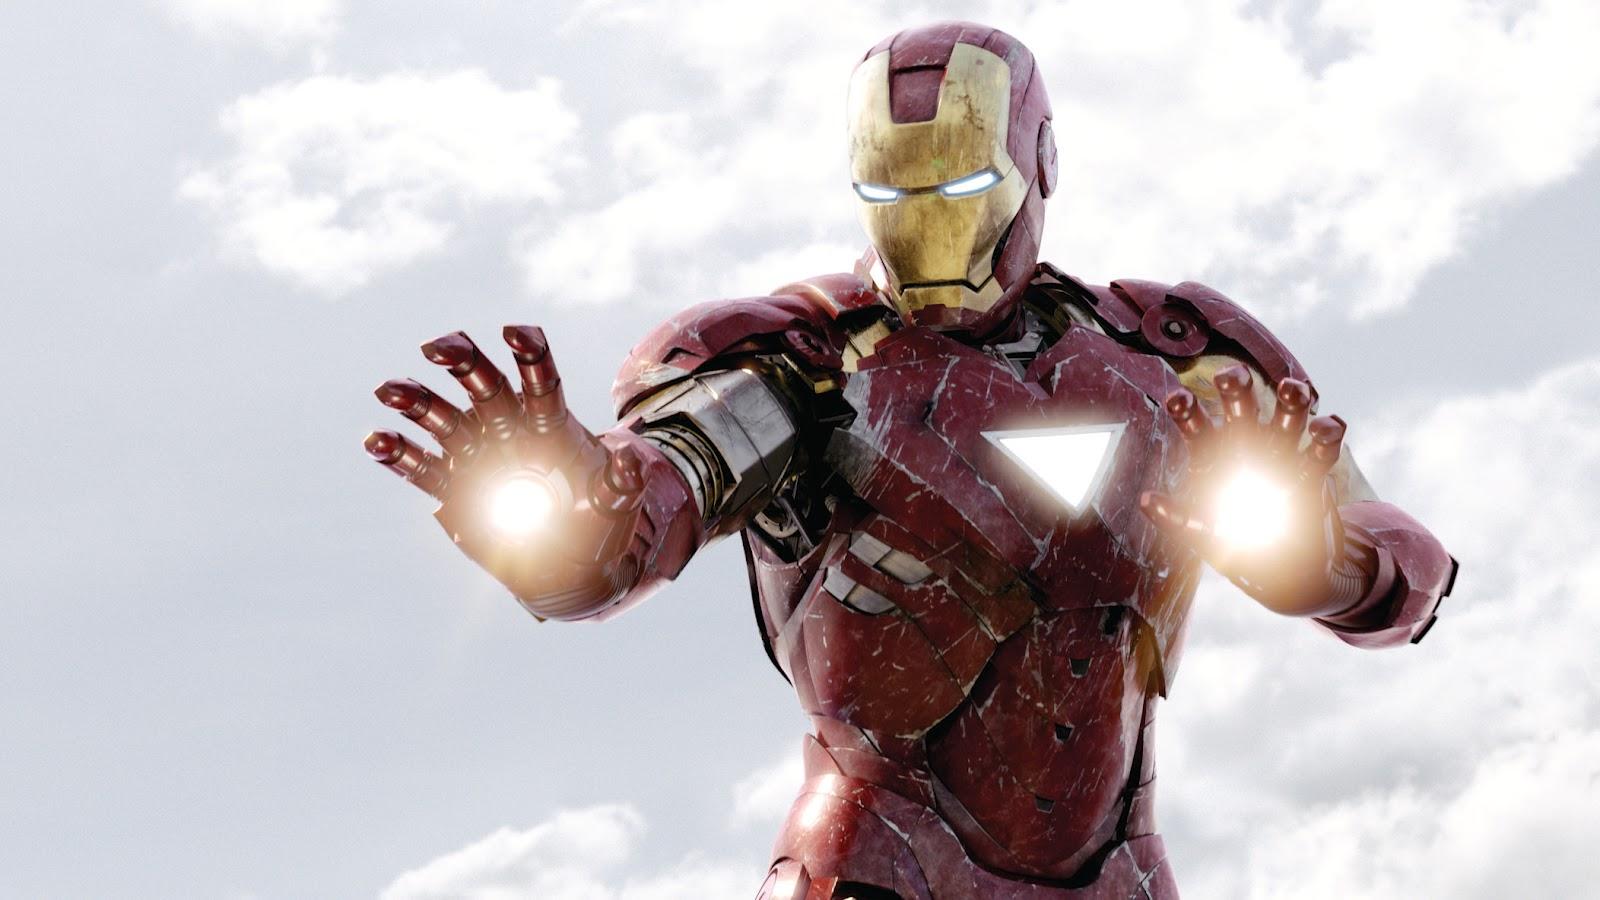 http://1.bp.blogspot.com/-Mg9vsNczPcE/T6X0NqYl0mI/AAAAAAAAAHE/0u-Ez2vraQ4/s1600/iron-man-battle-avengers.jpg